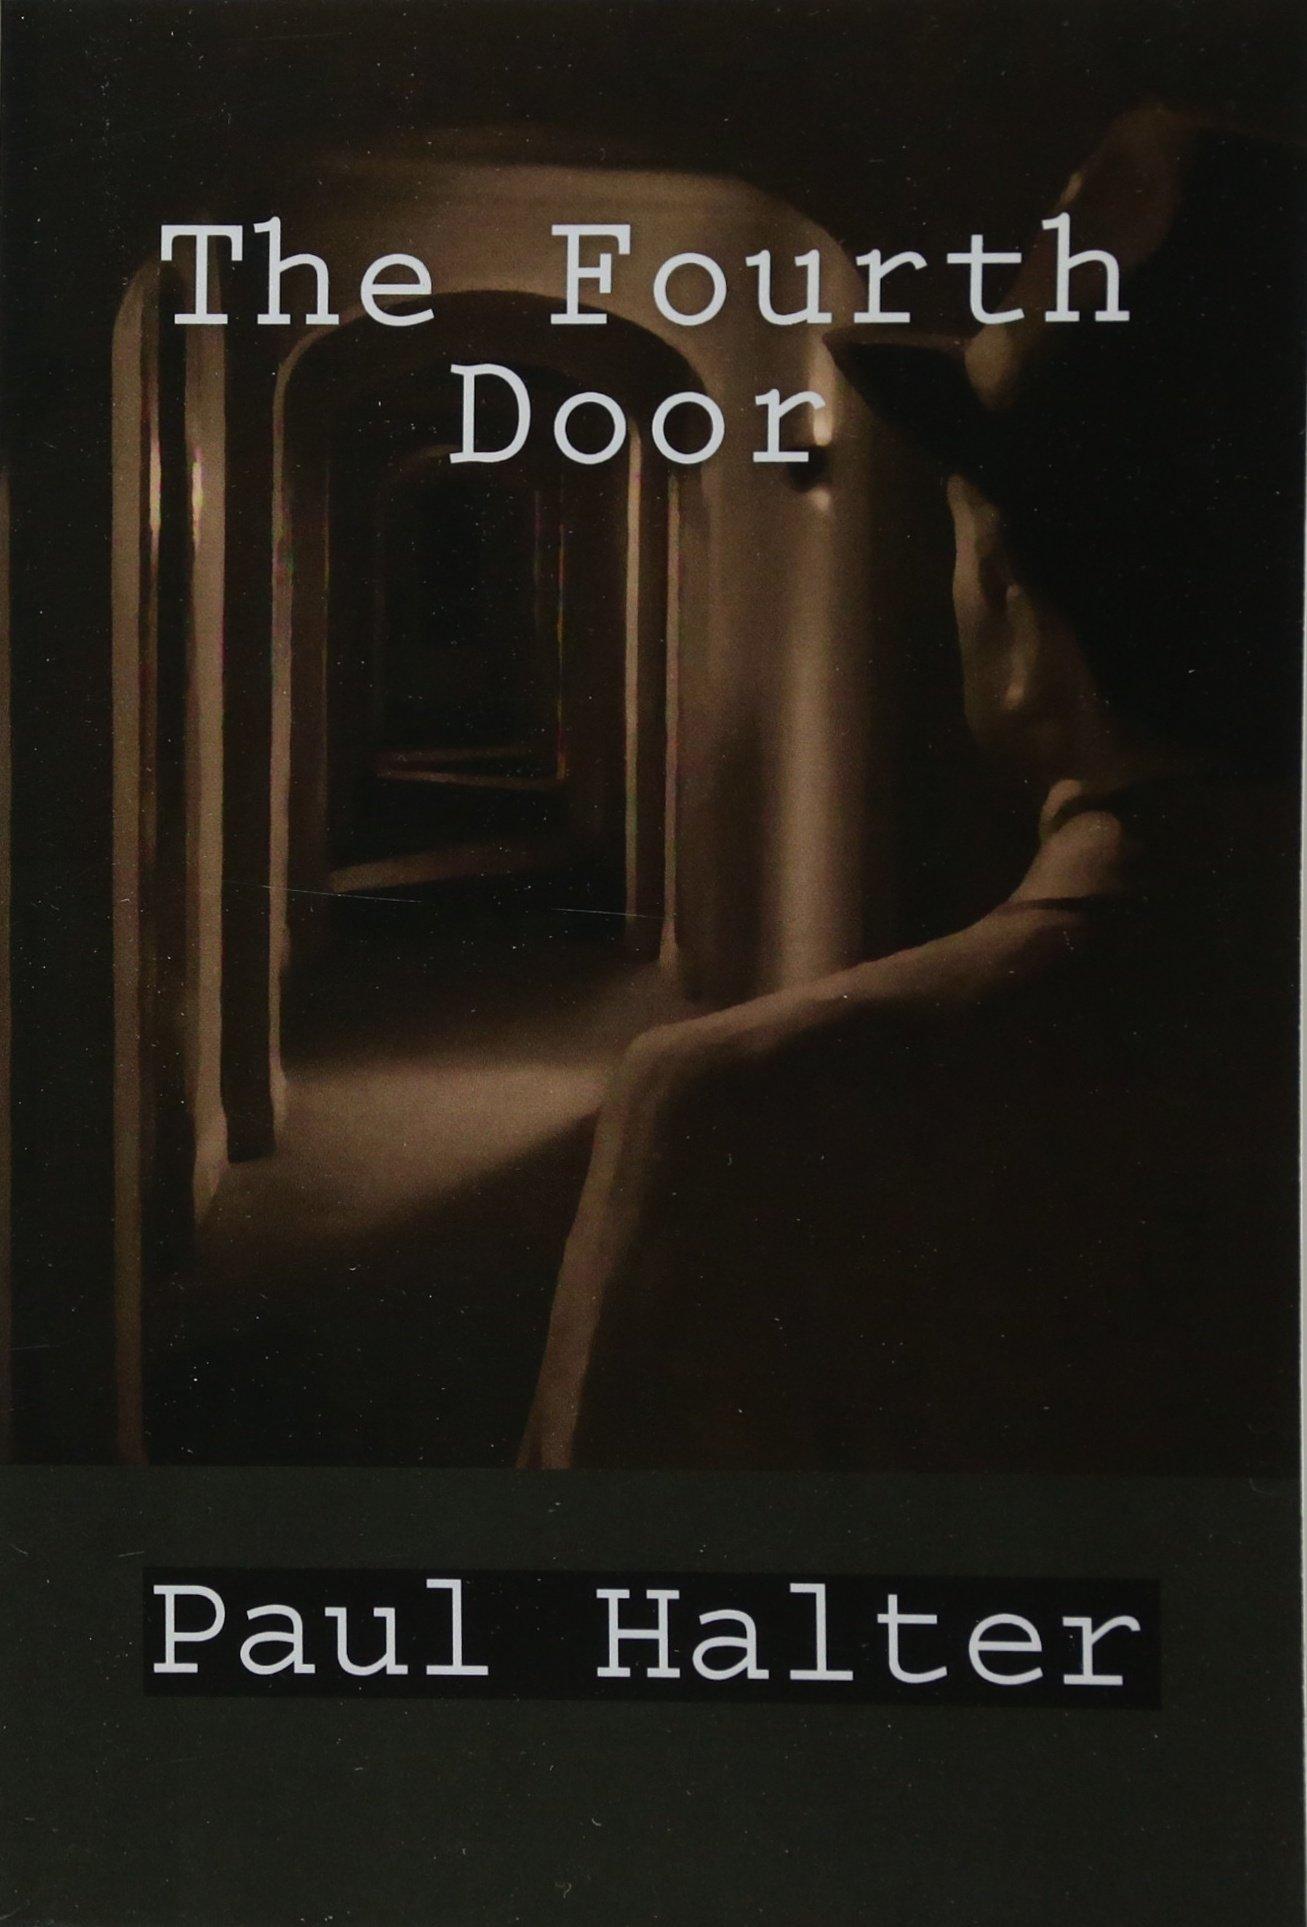 The Fourth Door: The Houdini Murders: Halter, Paul, Pugmire, John:  9781461176589: Amazon.com: Books